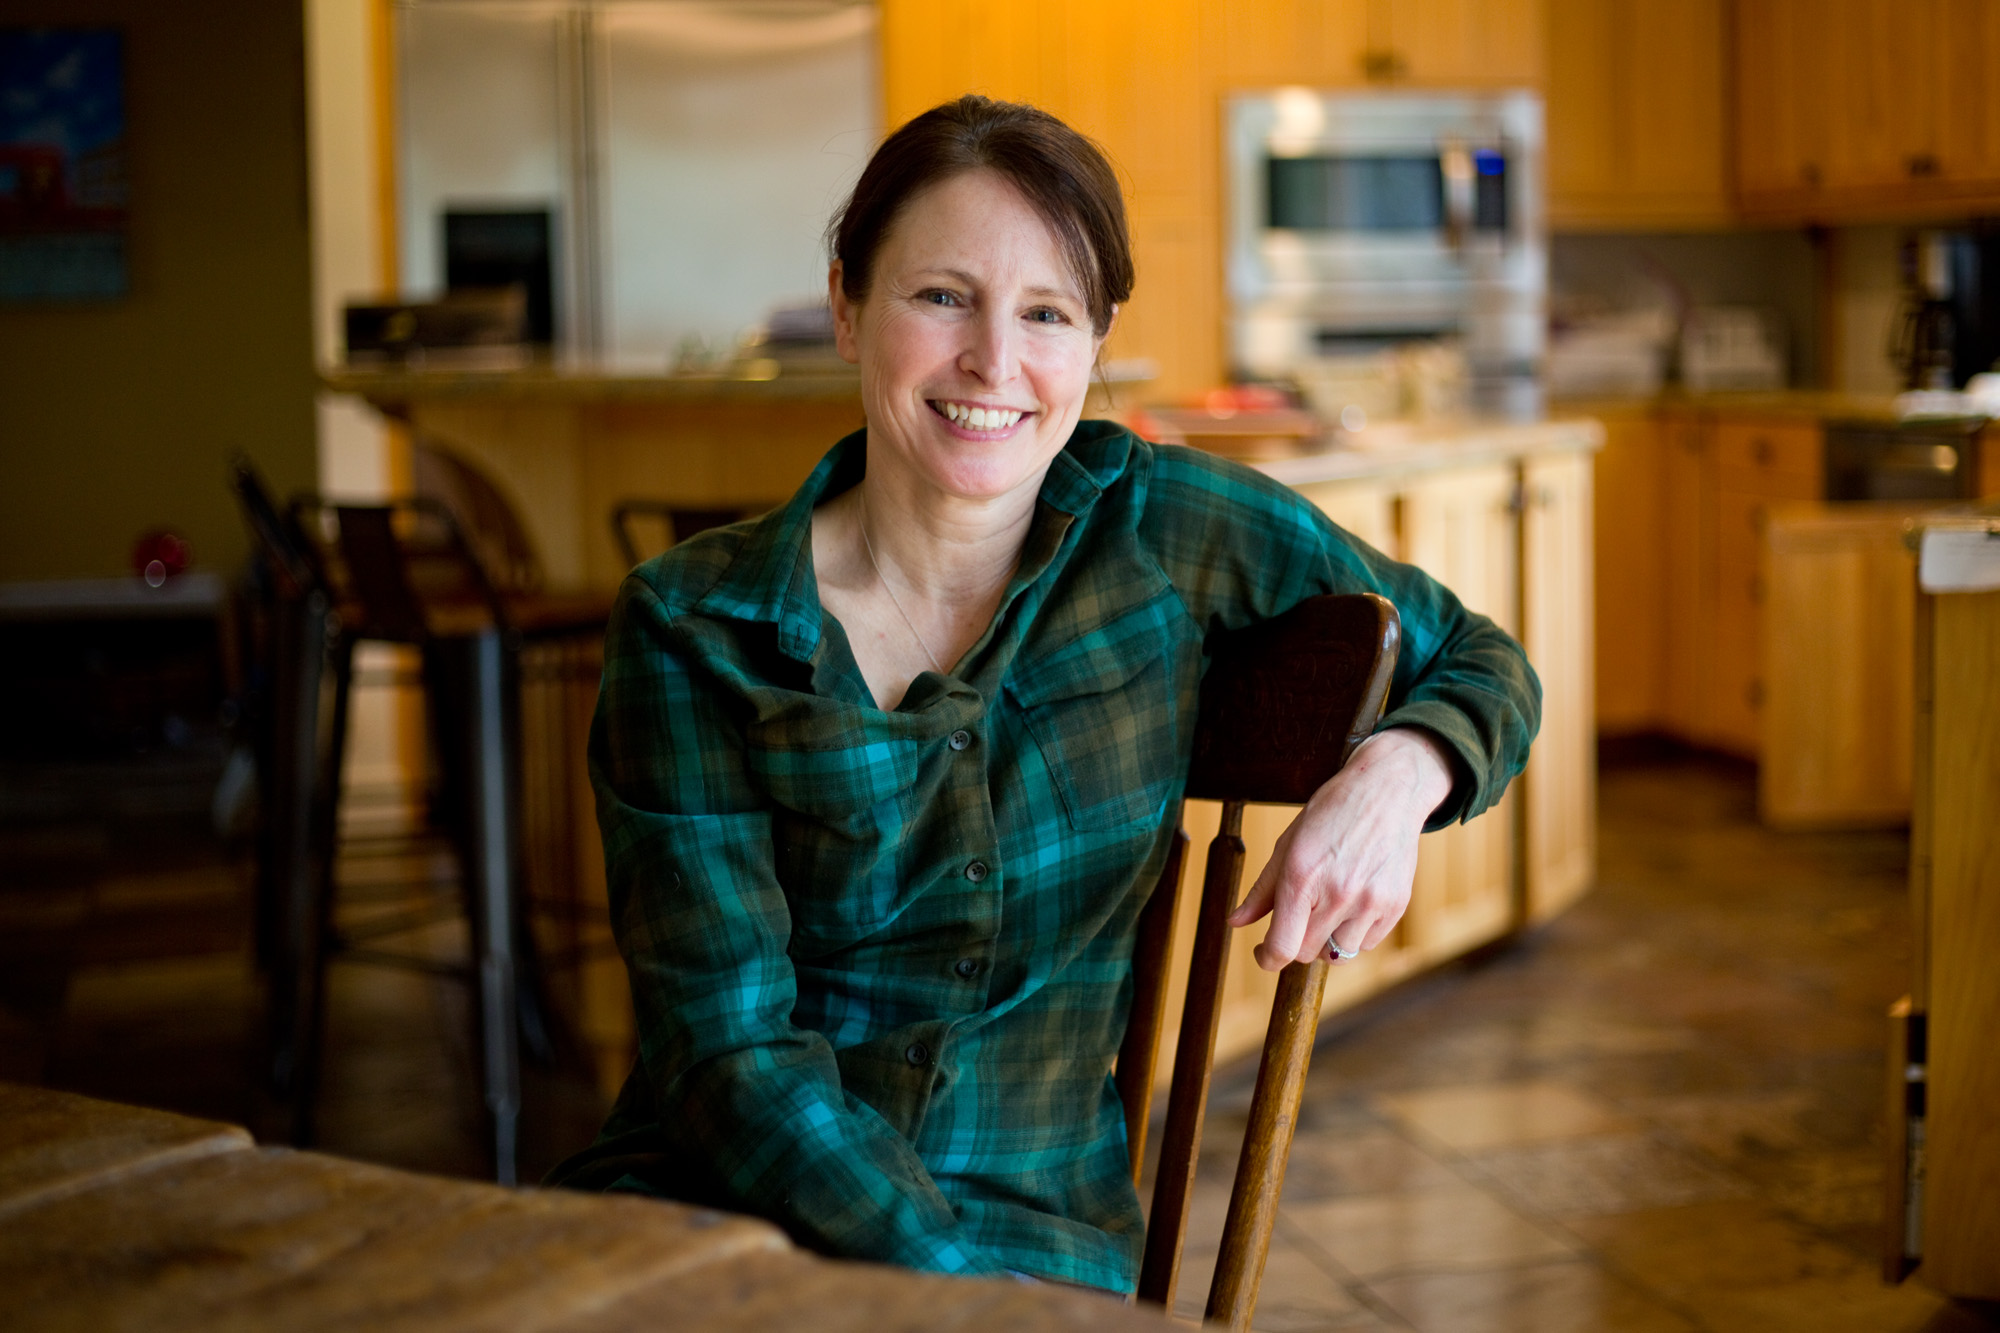 Amanda Conde, 51, at her home